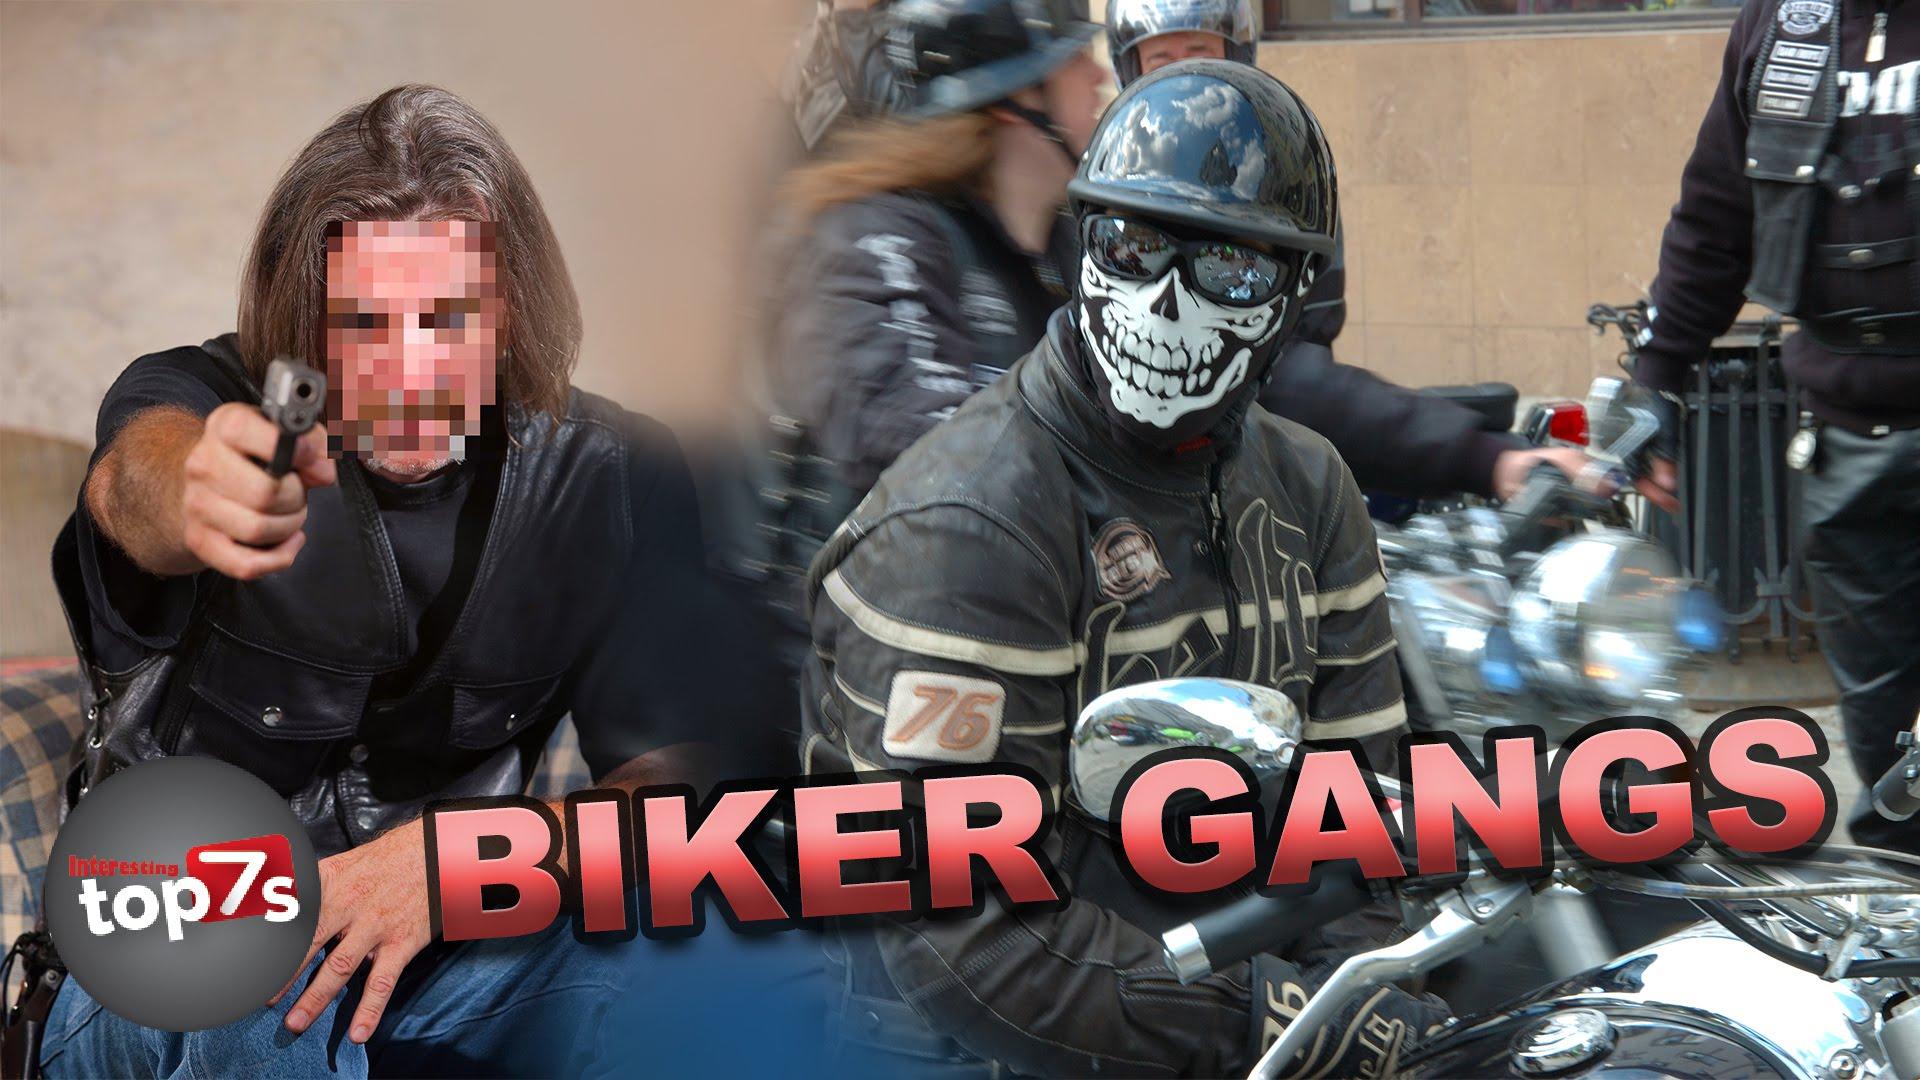 Top 7 Most Dangerous Biker Gangs - YouTube